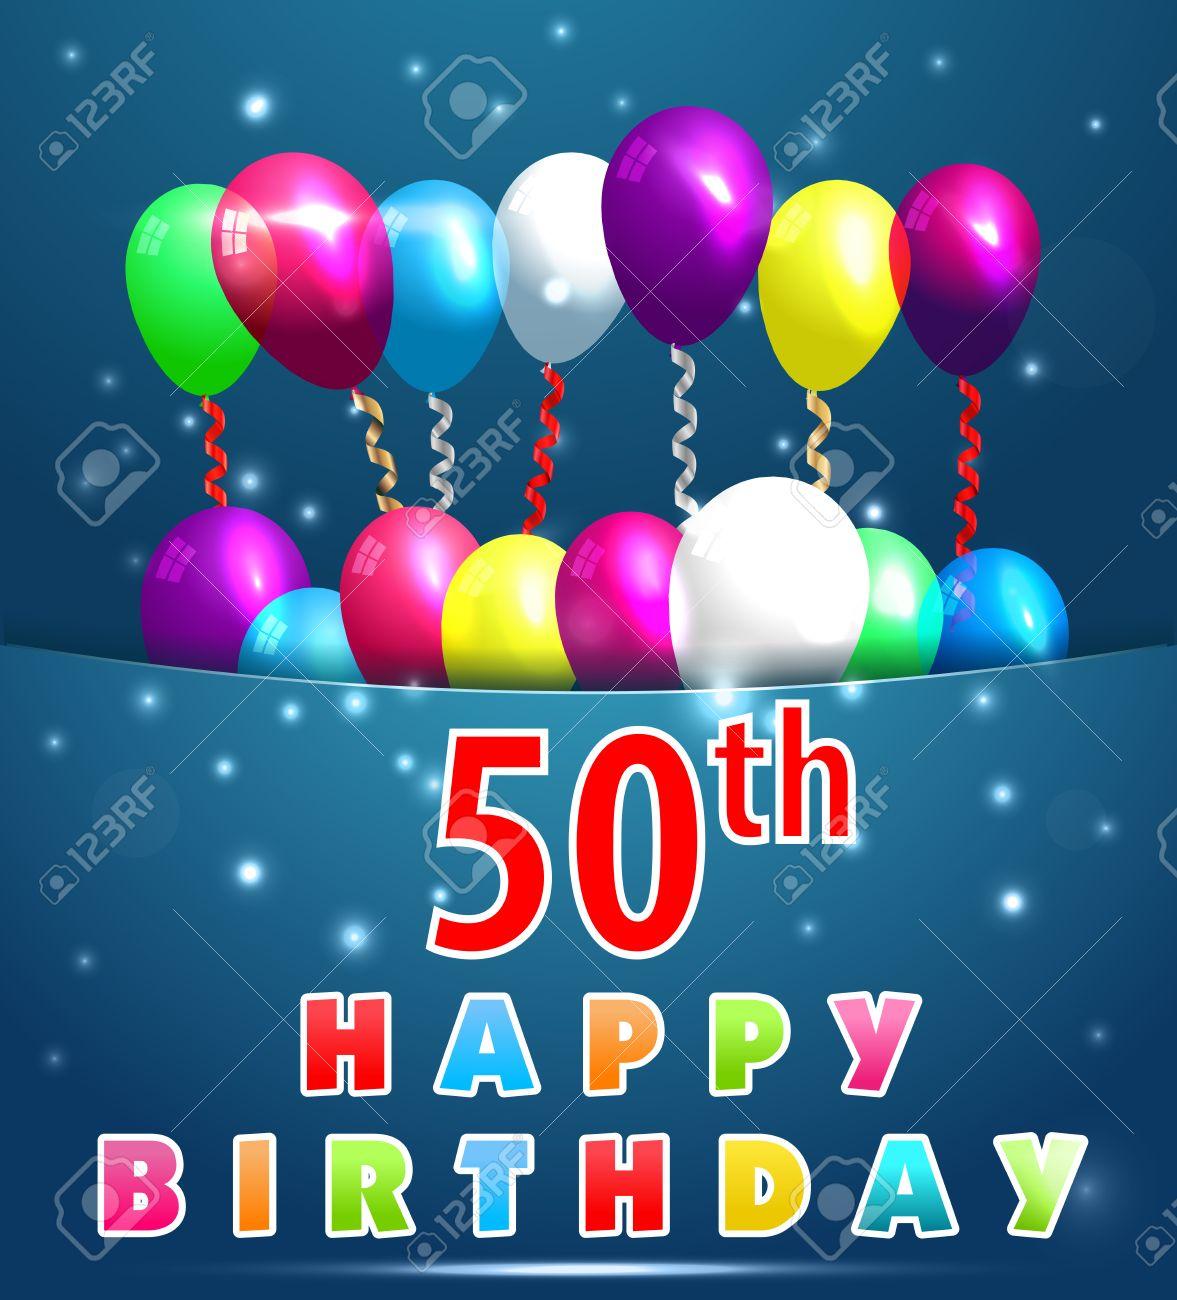 Karte 50 Geburtstag.Stock Photo